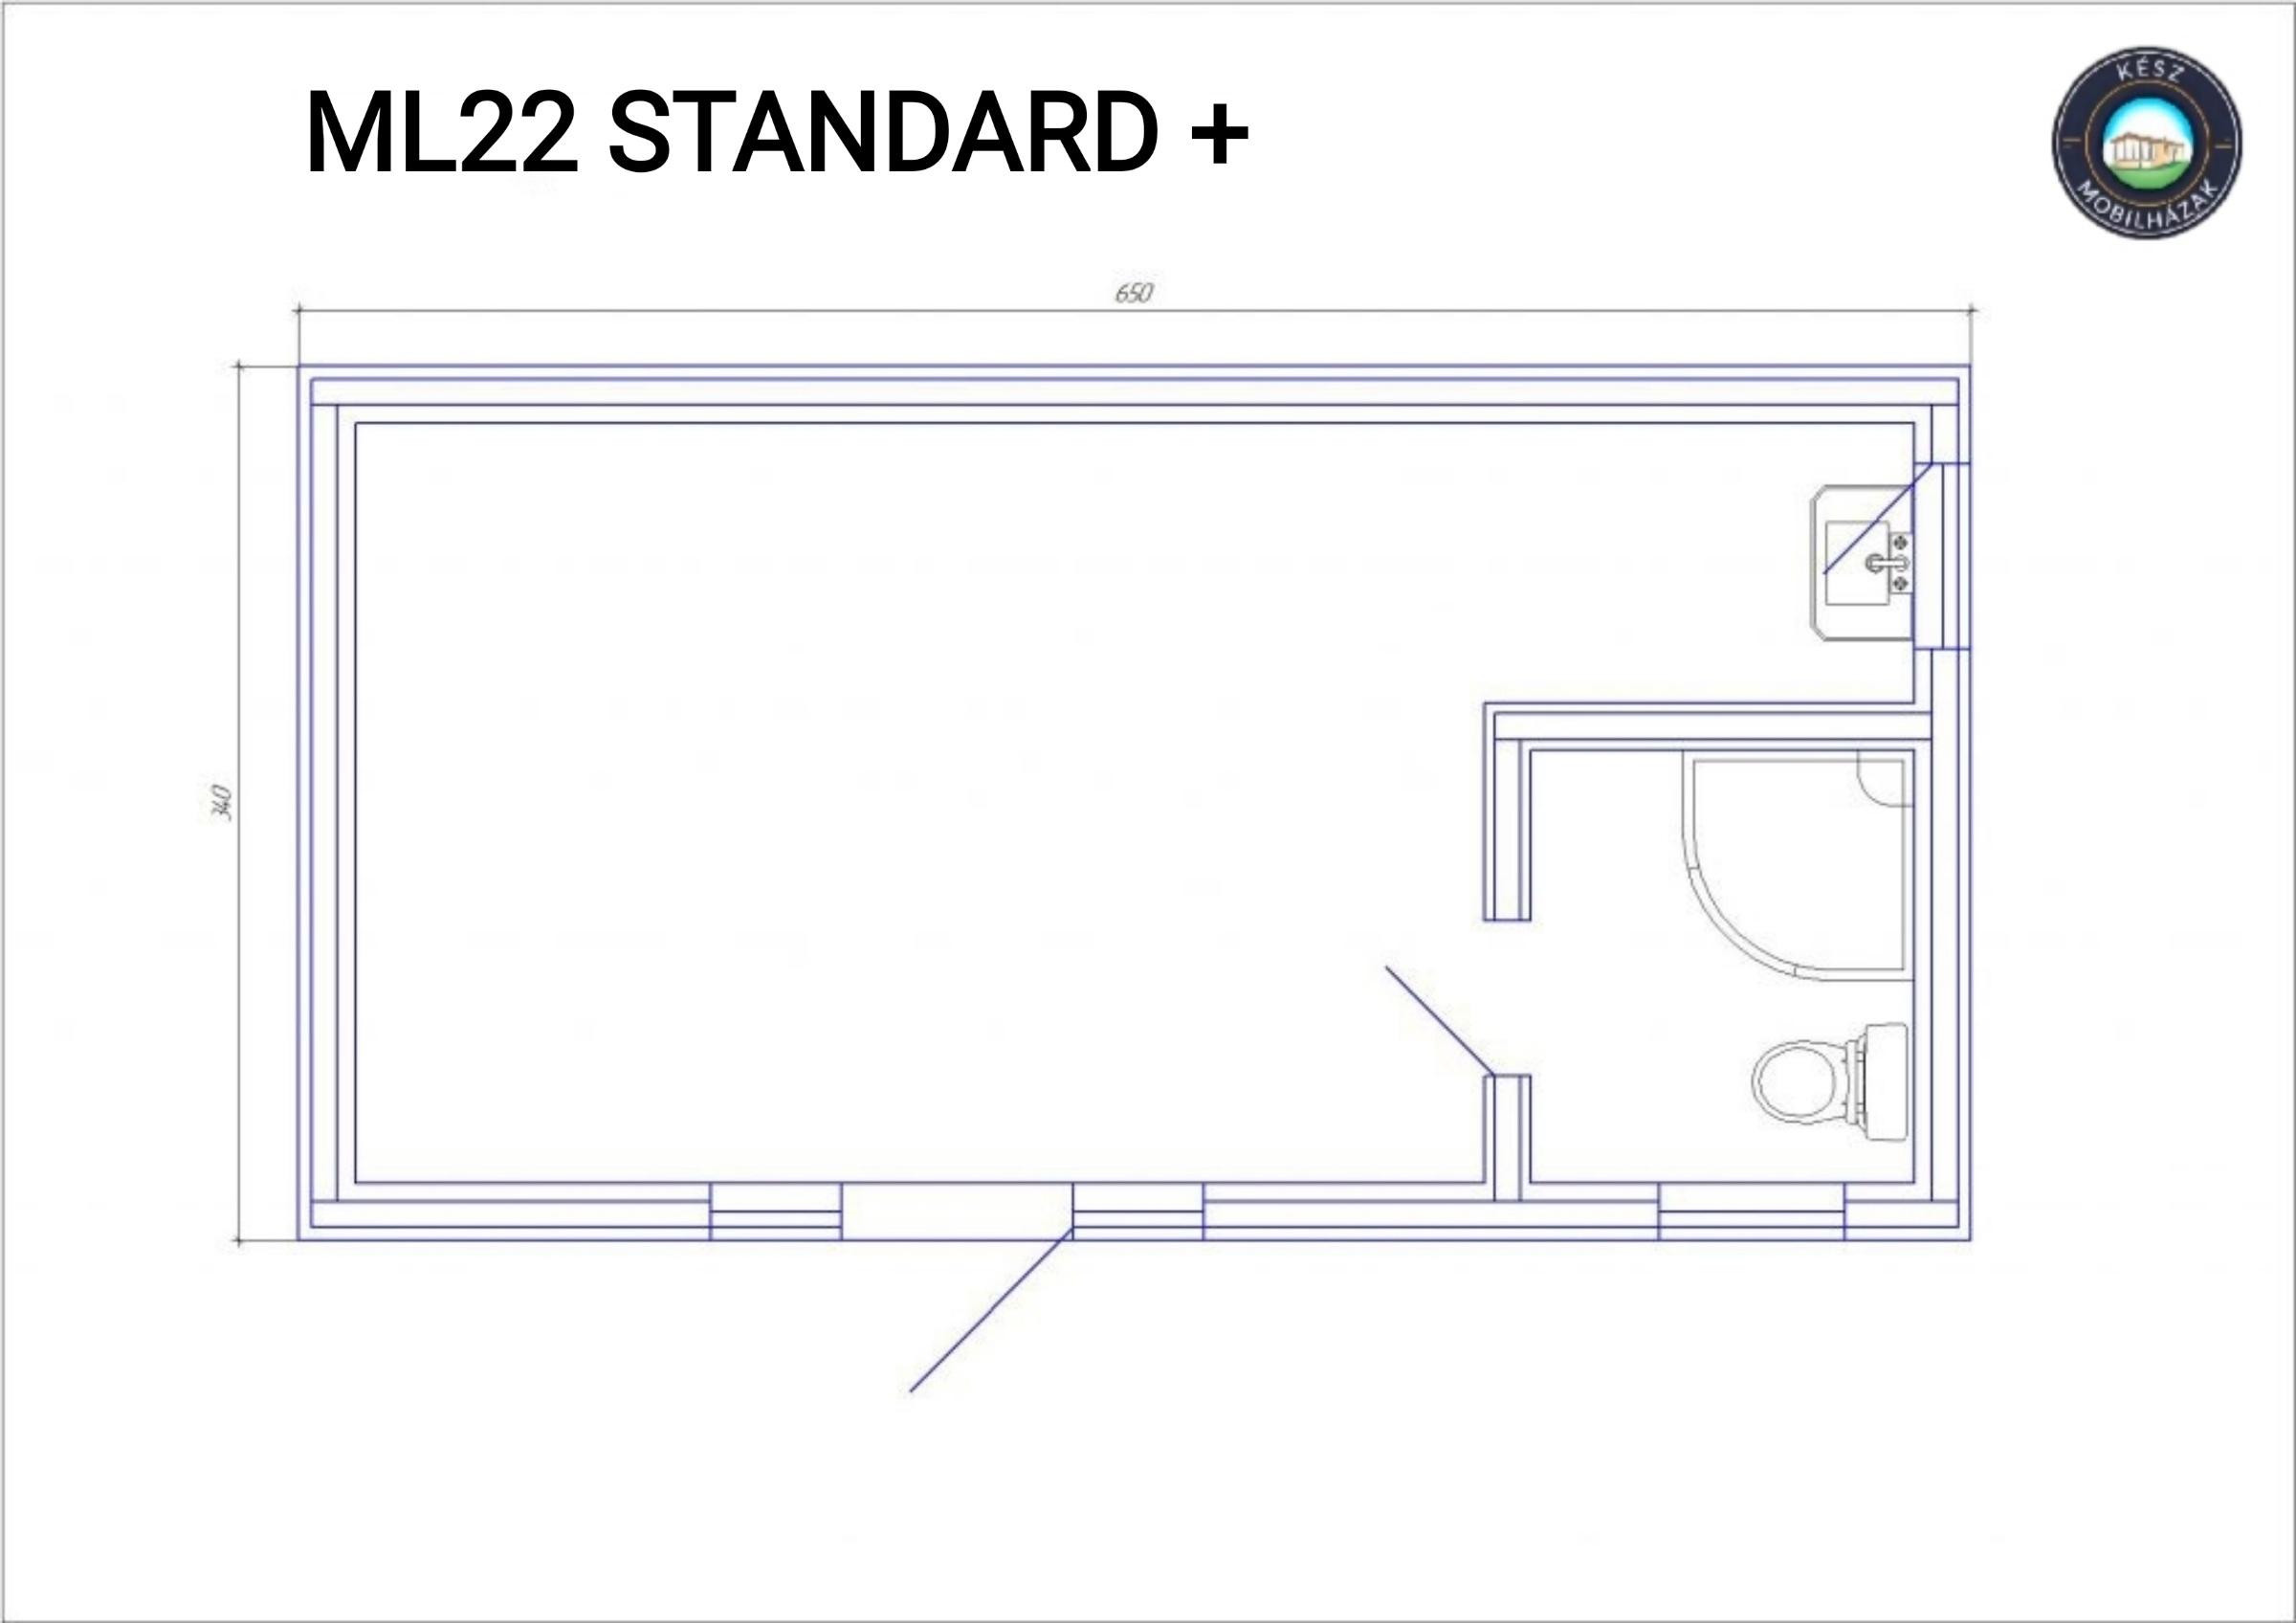 ML22 STANDARD+